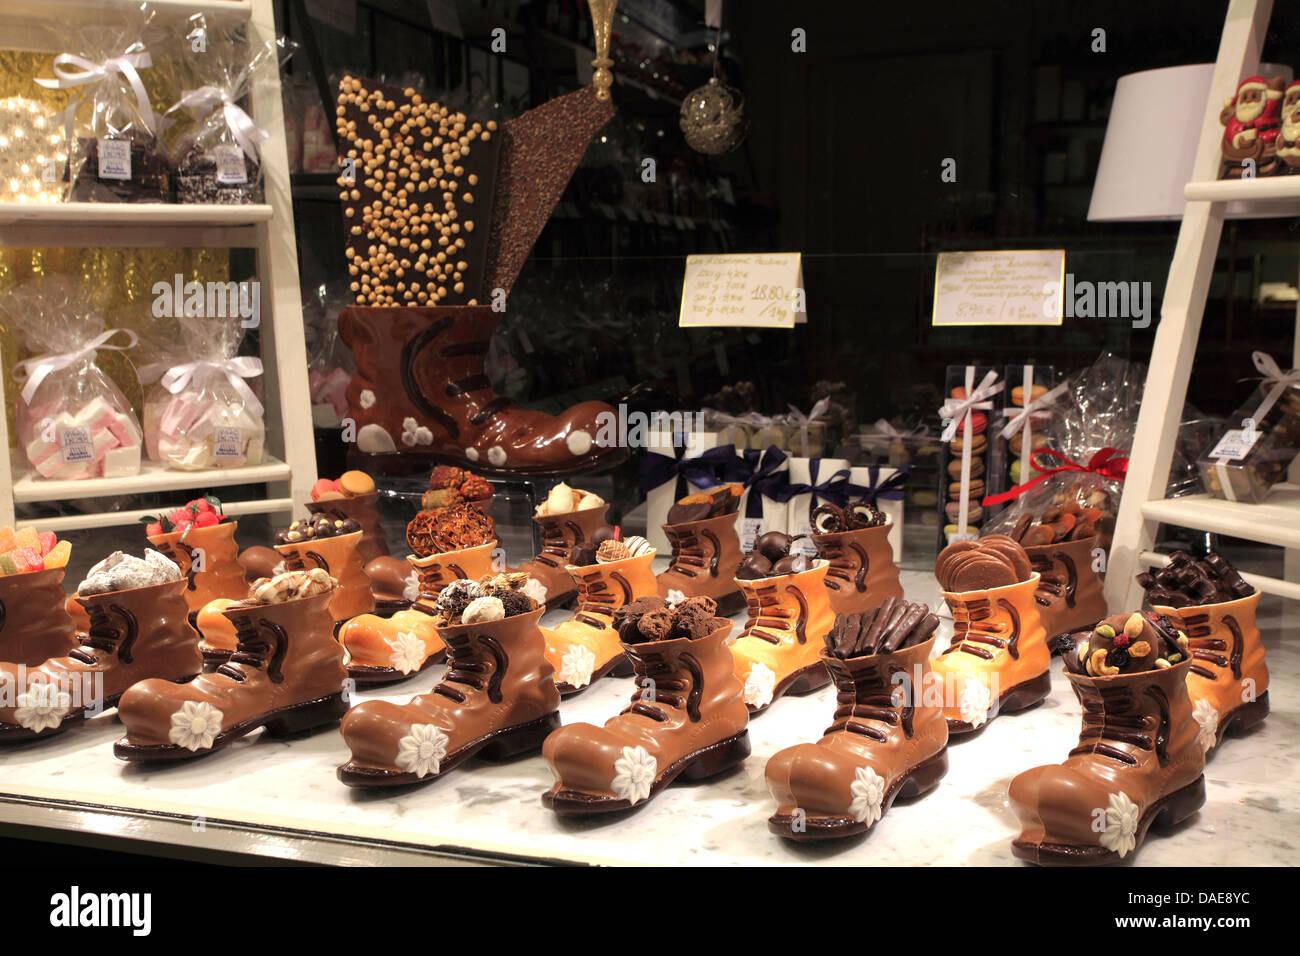 Brugge Chocolate Shop Stock Photos & Brugge Chocolate Shop Stock ...